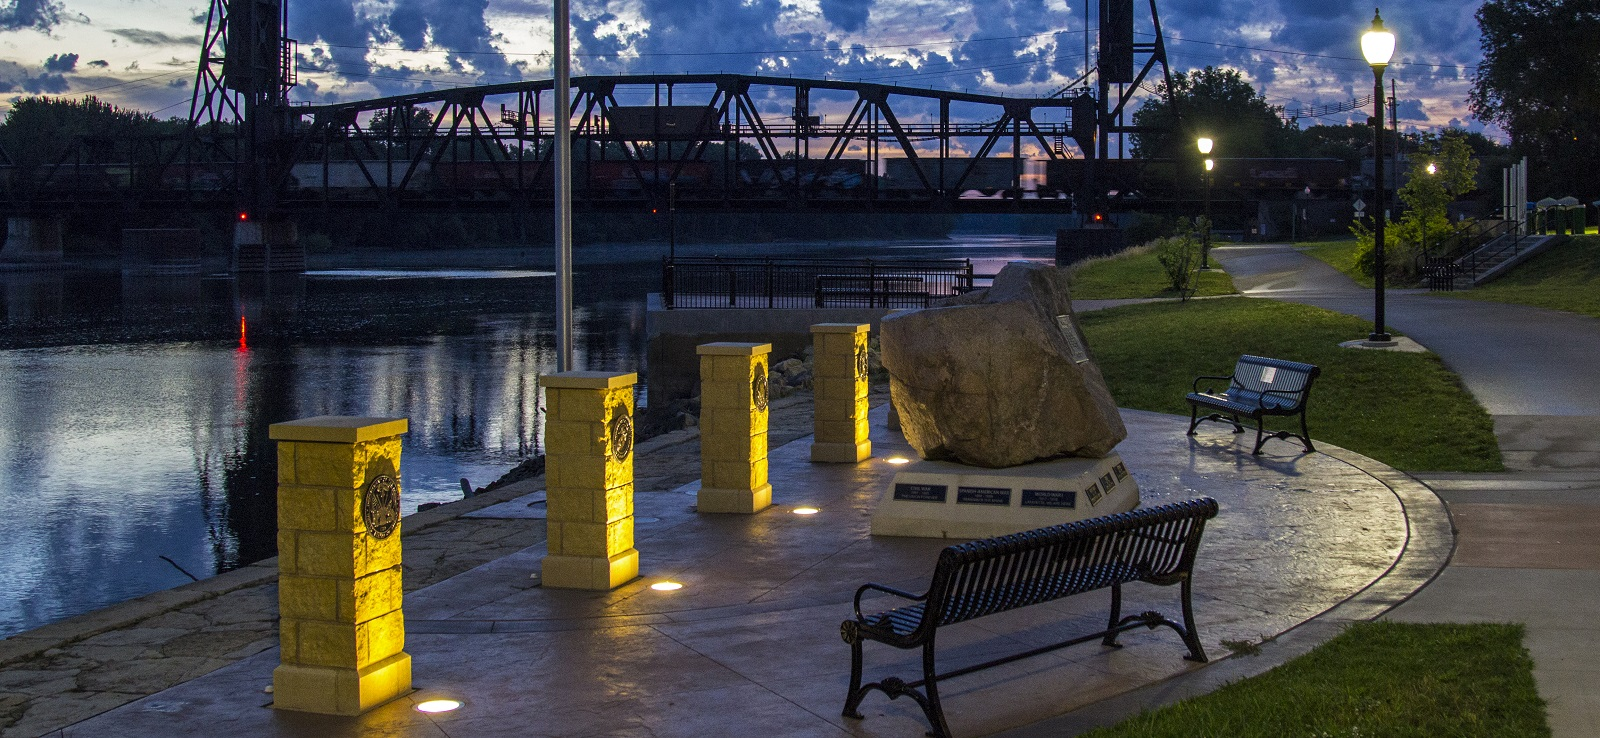 Hastings Historic Downtown and Riverwalk